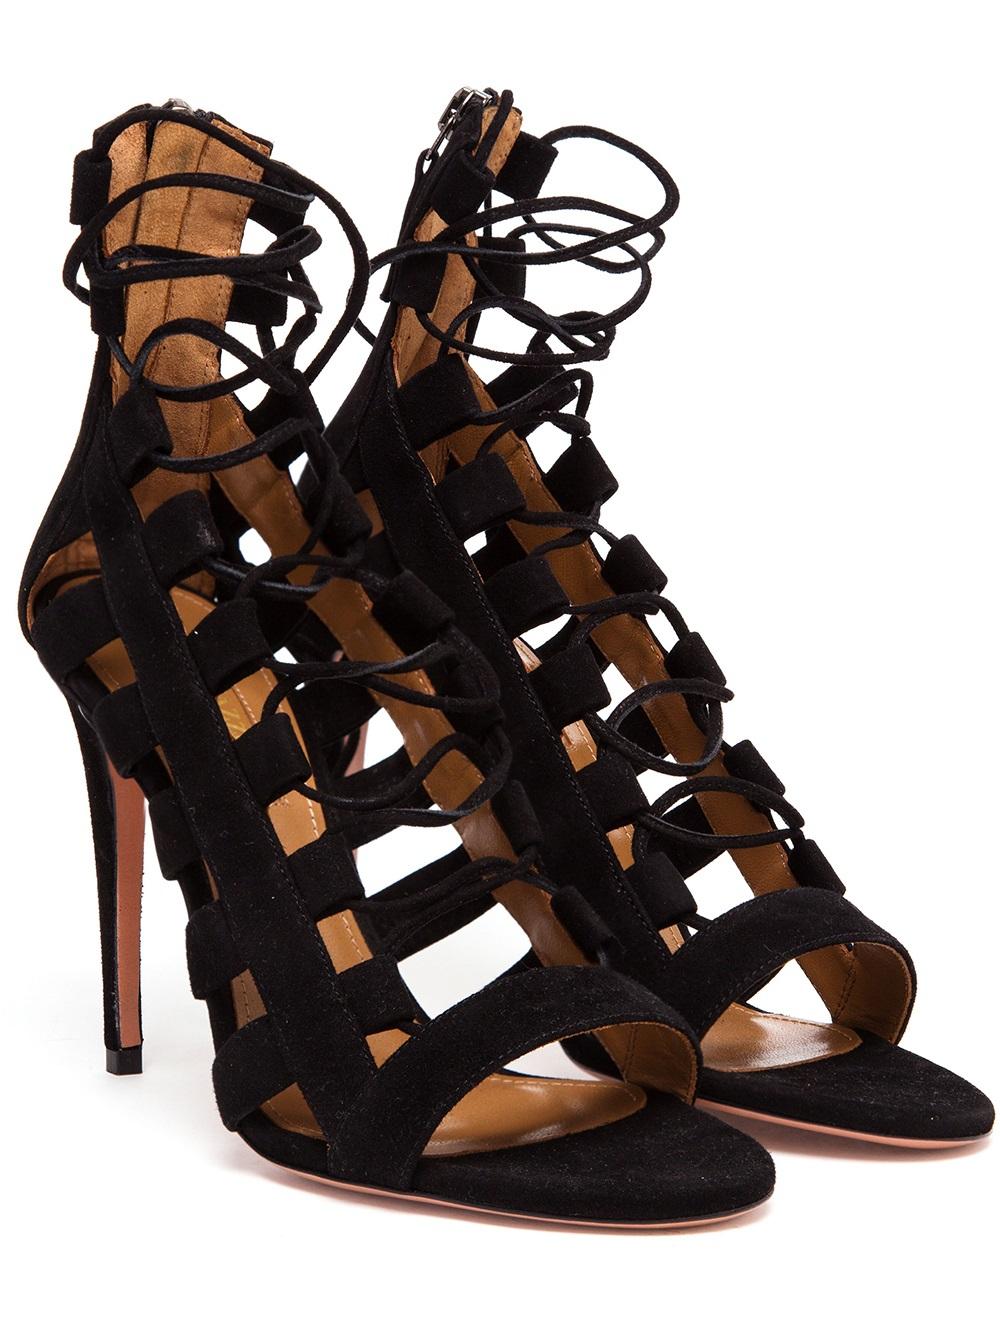 8752480e97ab3 Lyst - Aquazzura Amazon Suede Lace Up Sandal in Black